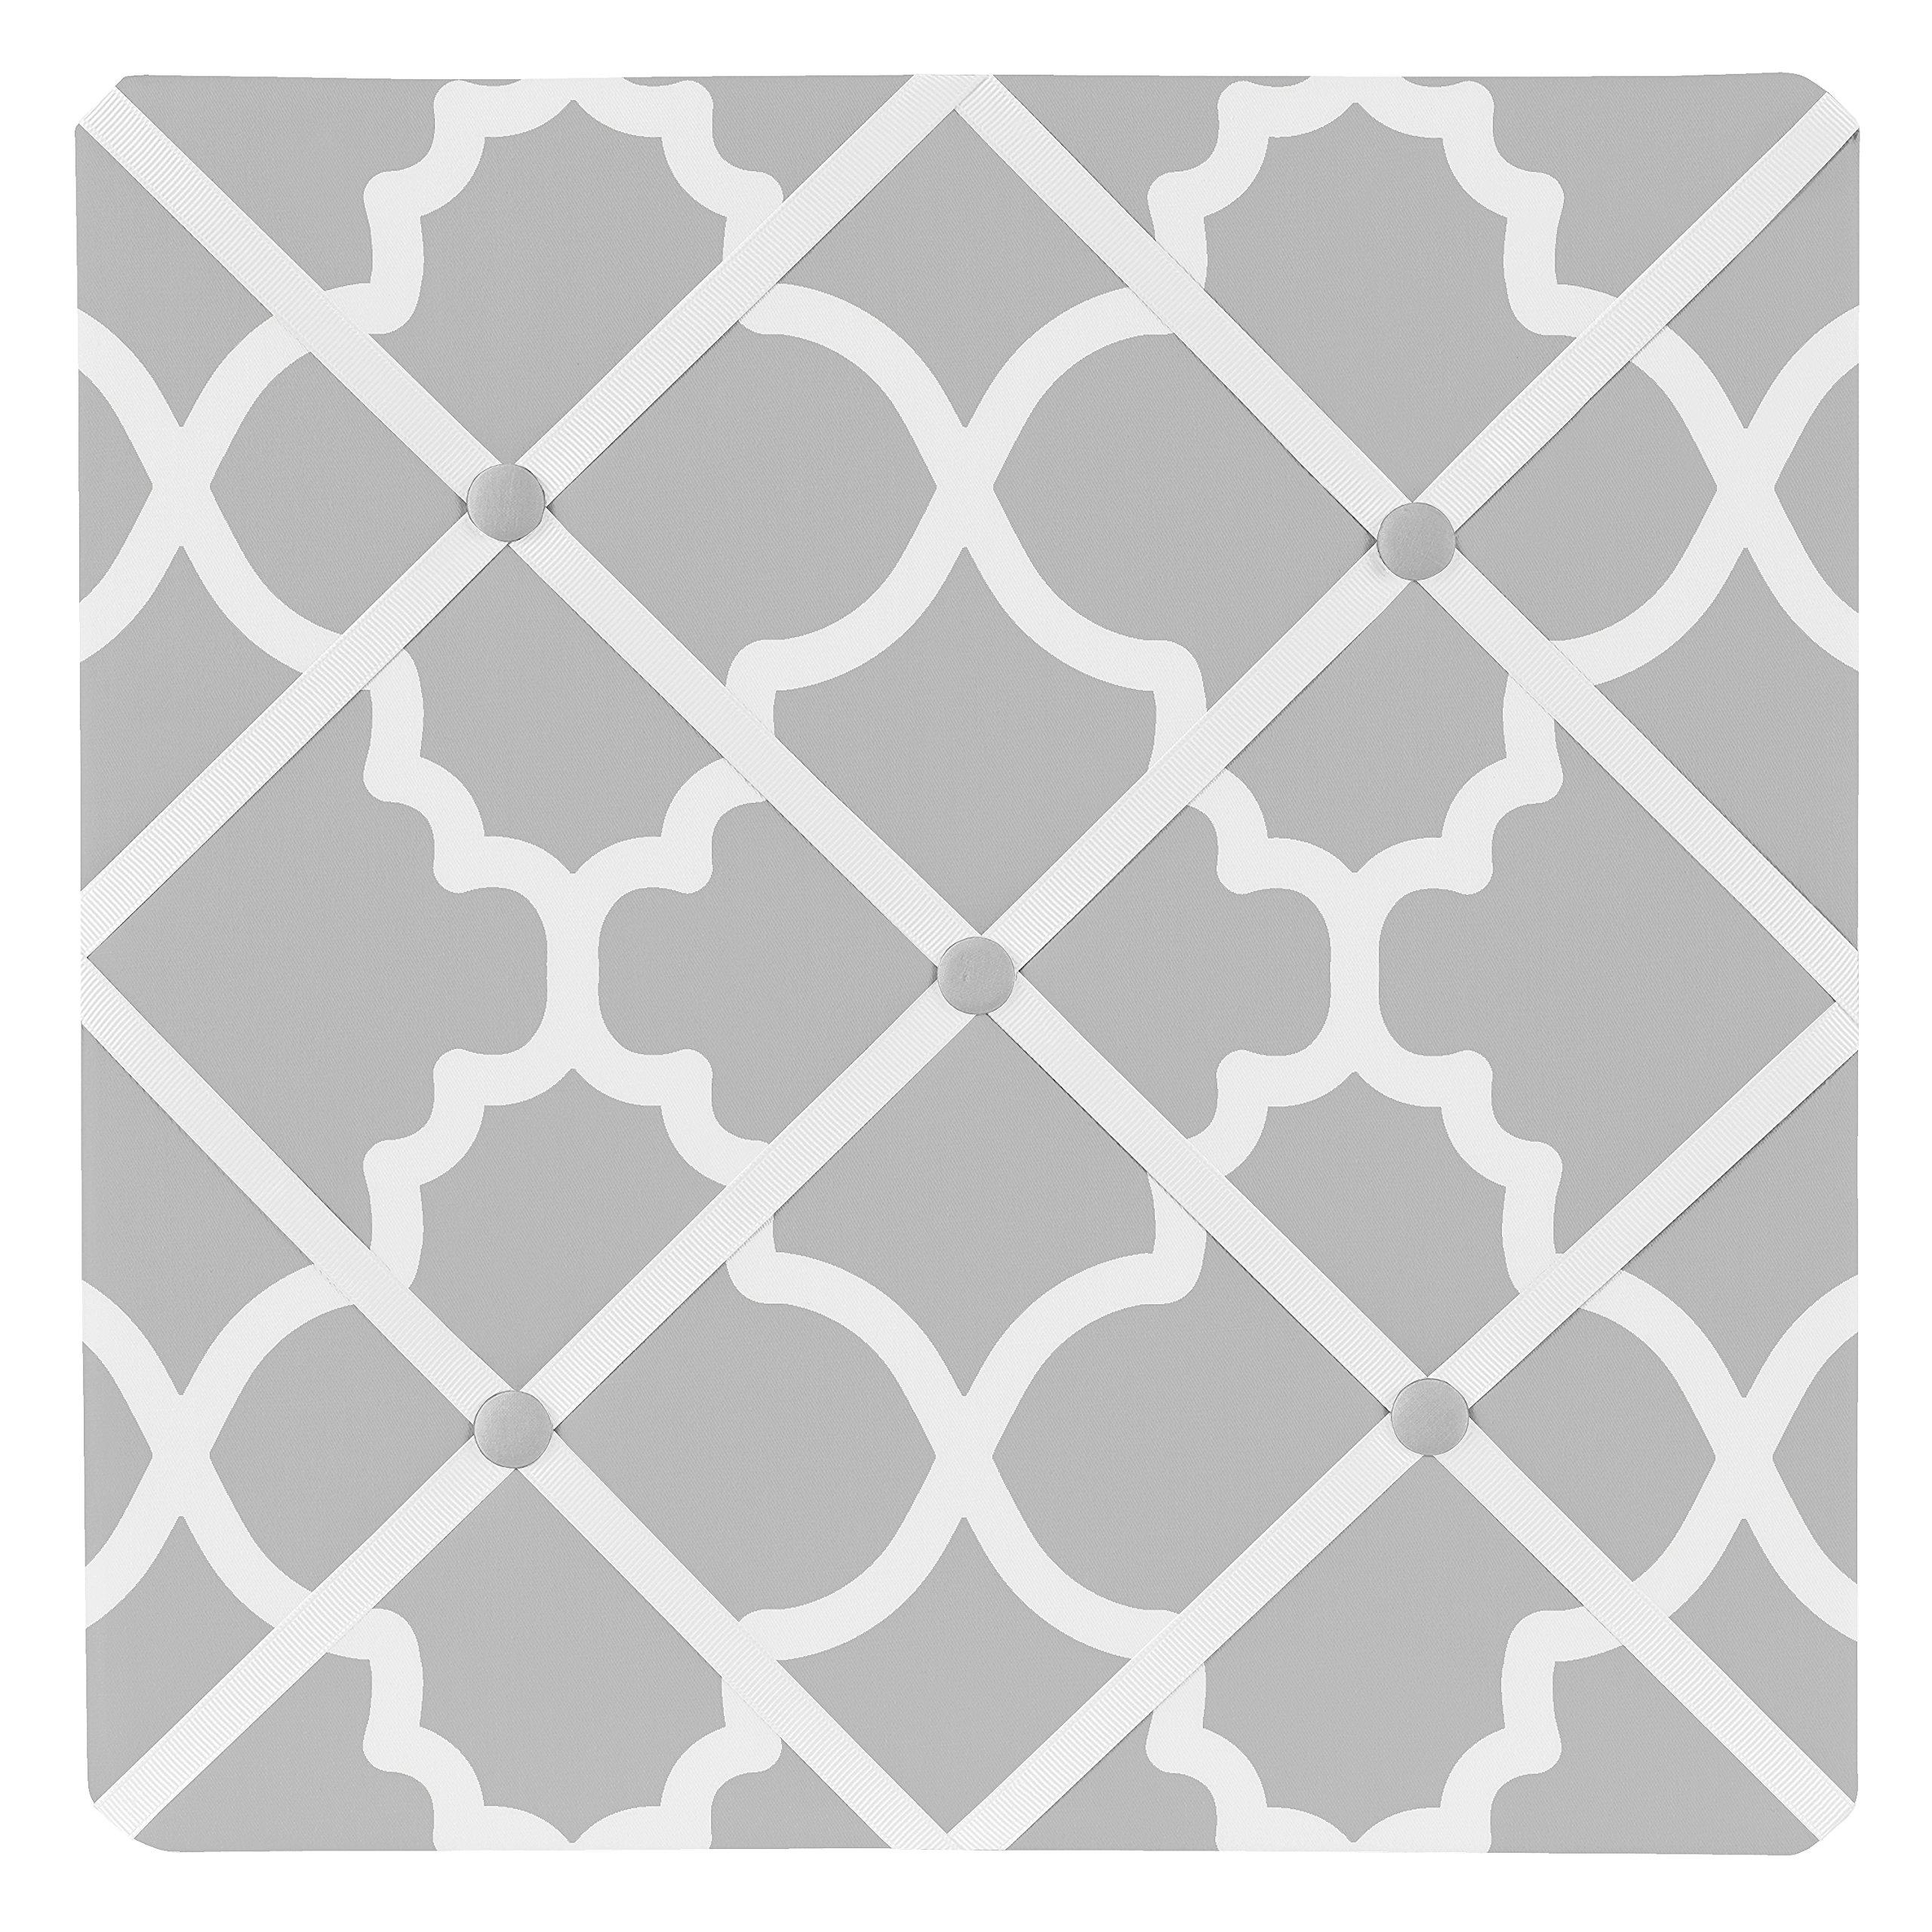 Sweet Jojo Designs Gray and White Trellis Print Lattice Fabric Memory/Memo Photo Bulletin Board by Sweet Jojo Designs